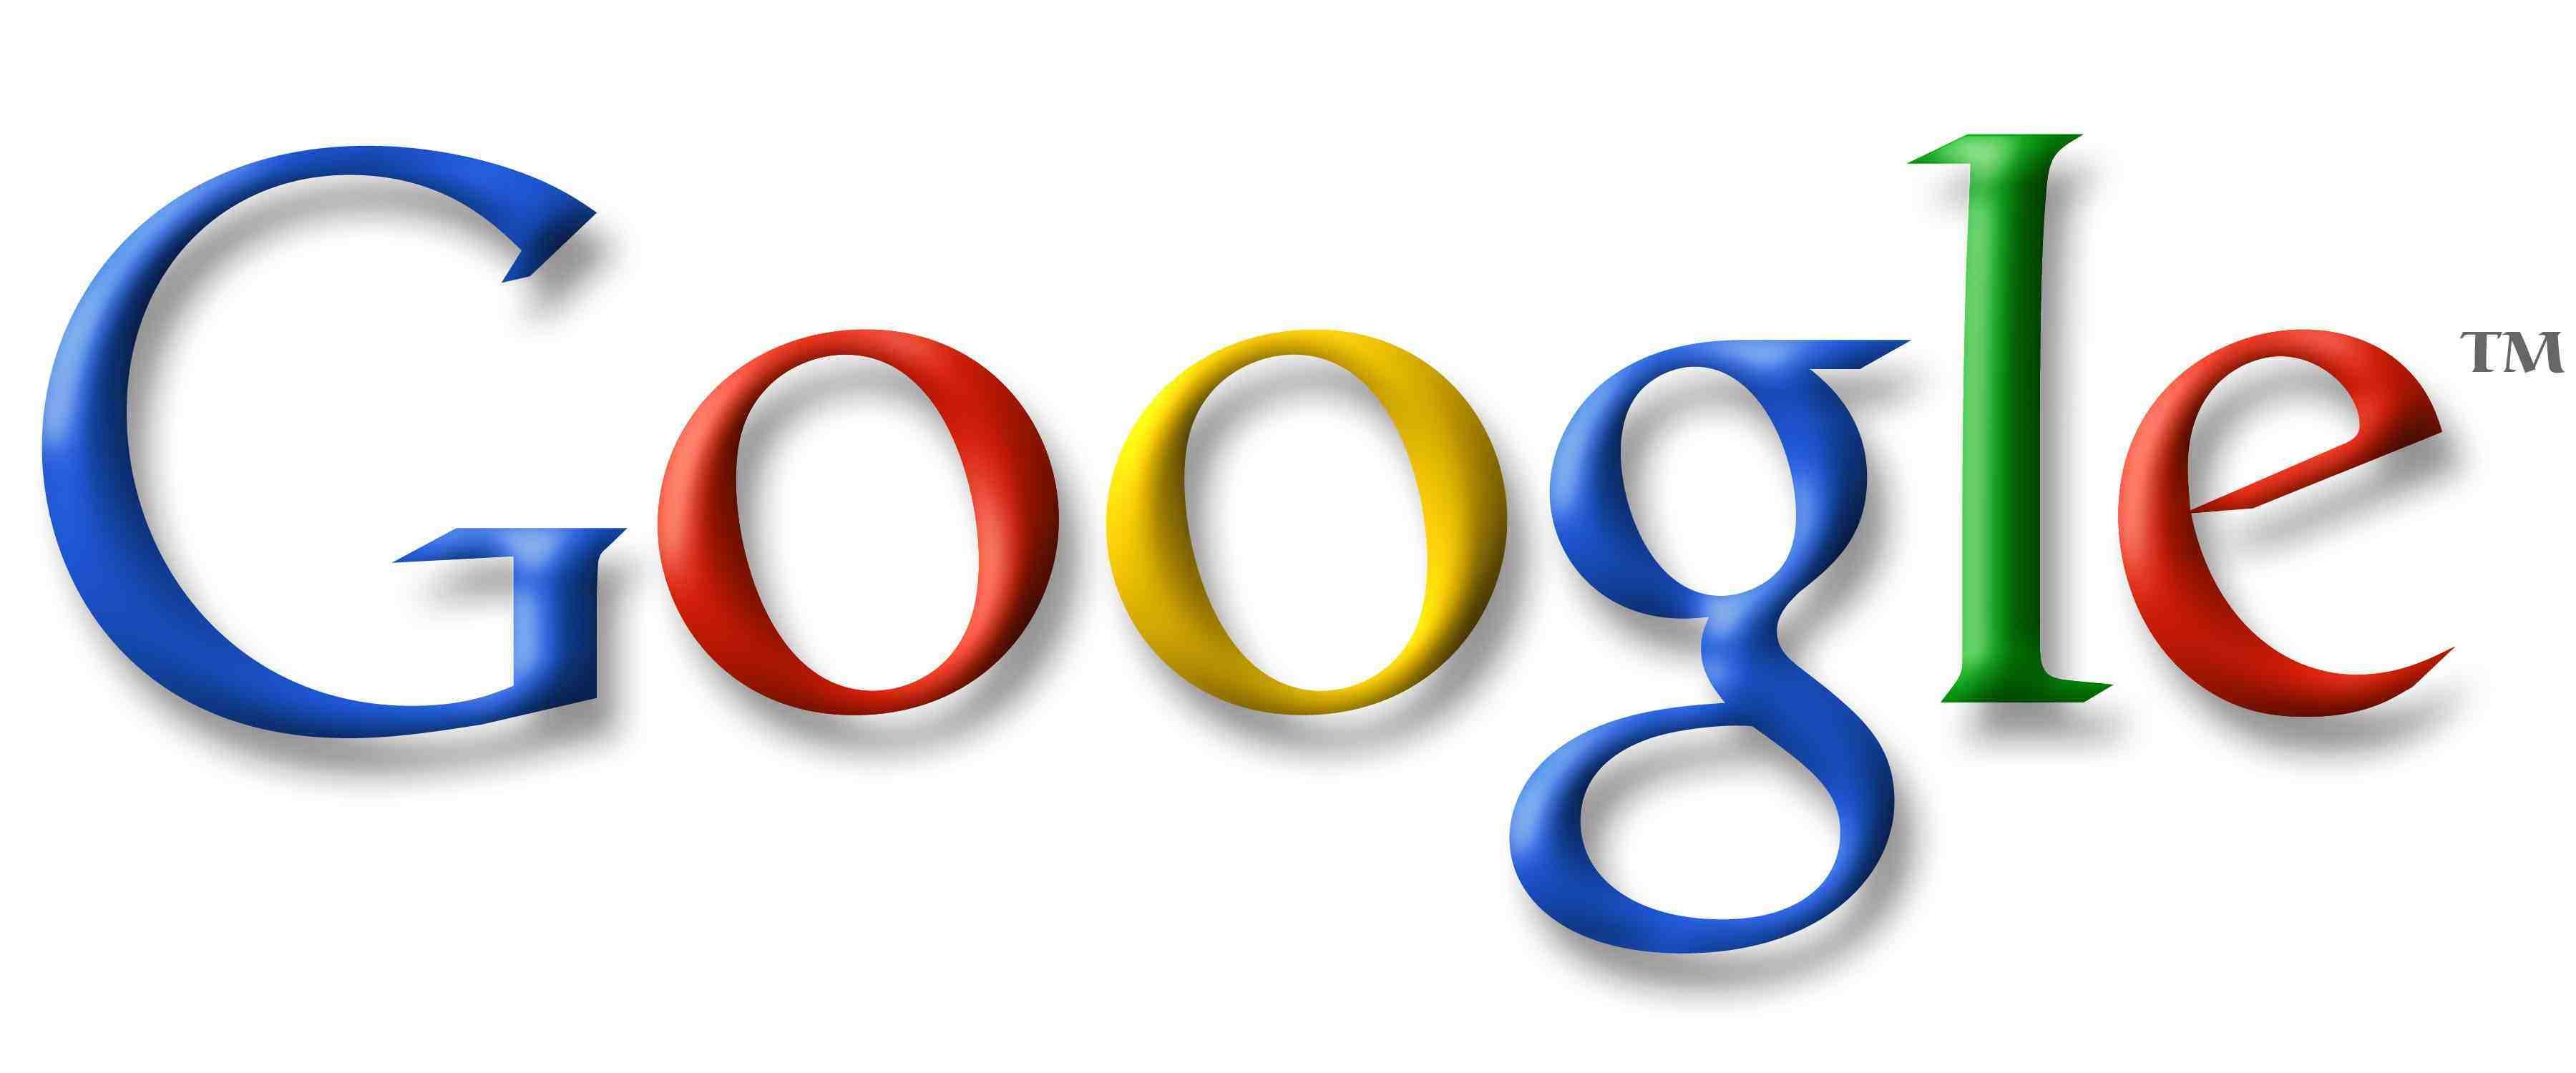 8 Google Vector Art Images